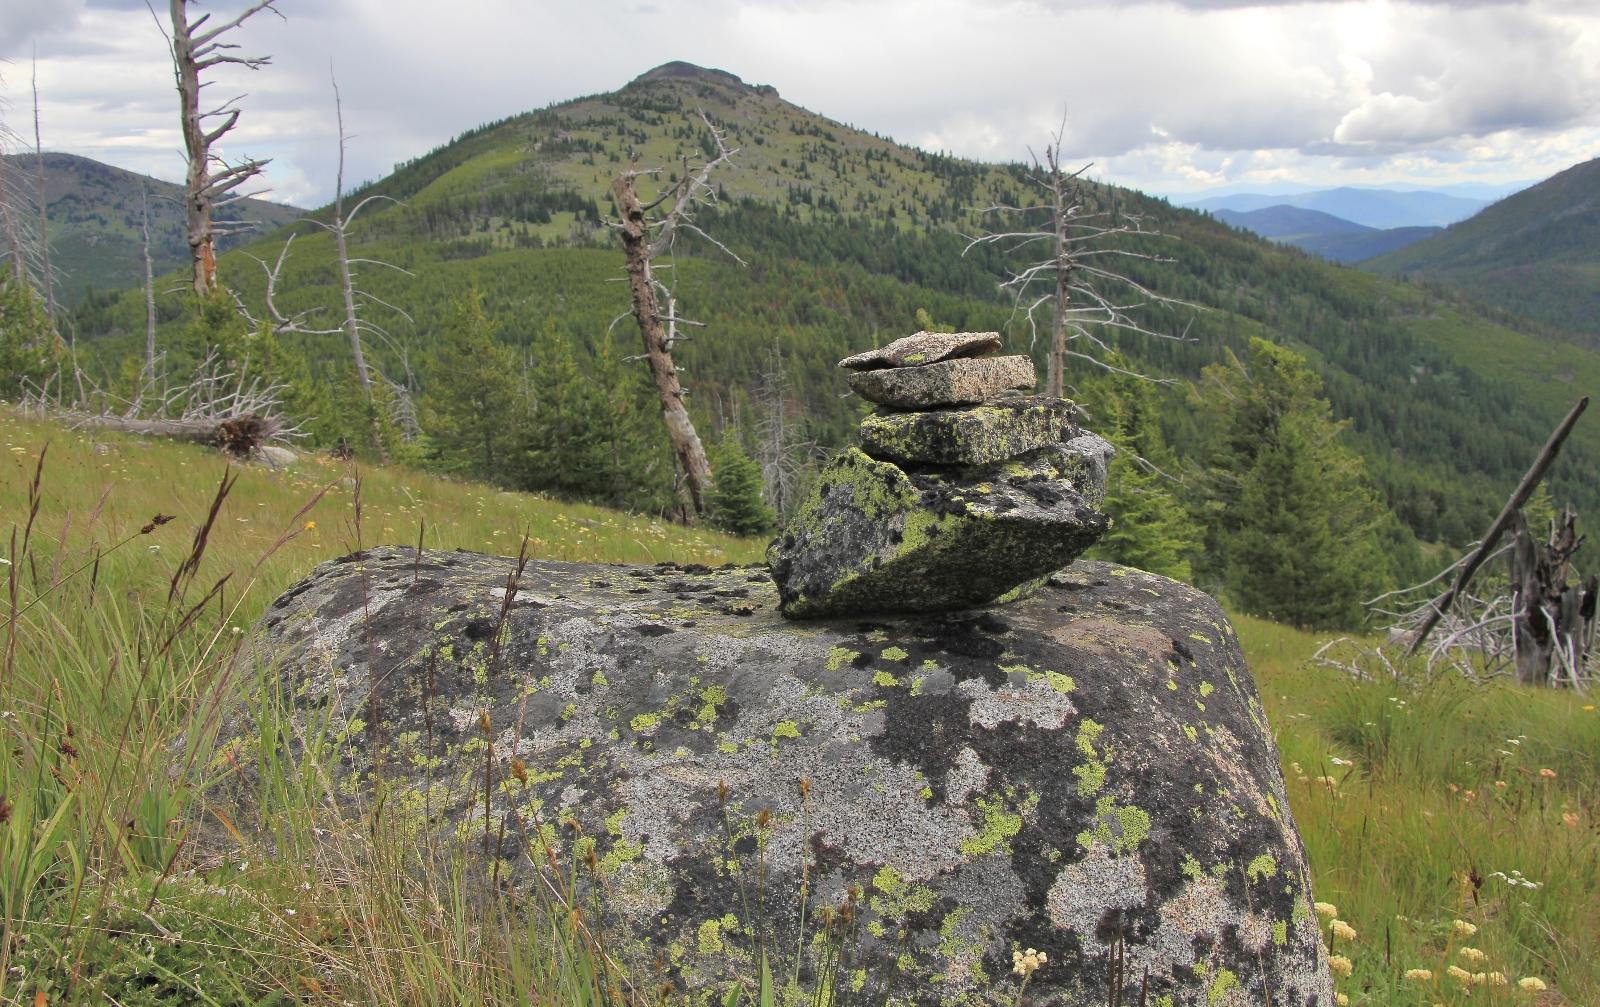 07-10-16-edds-mountain-63